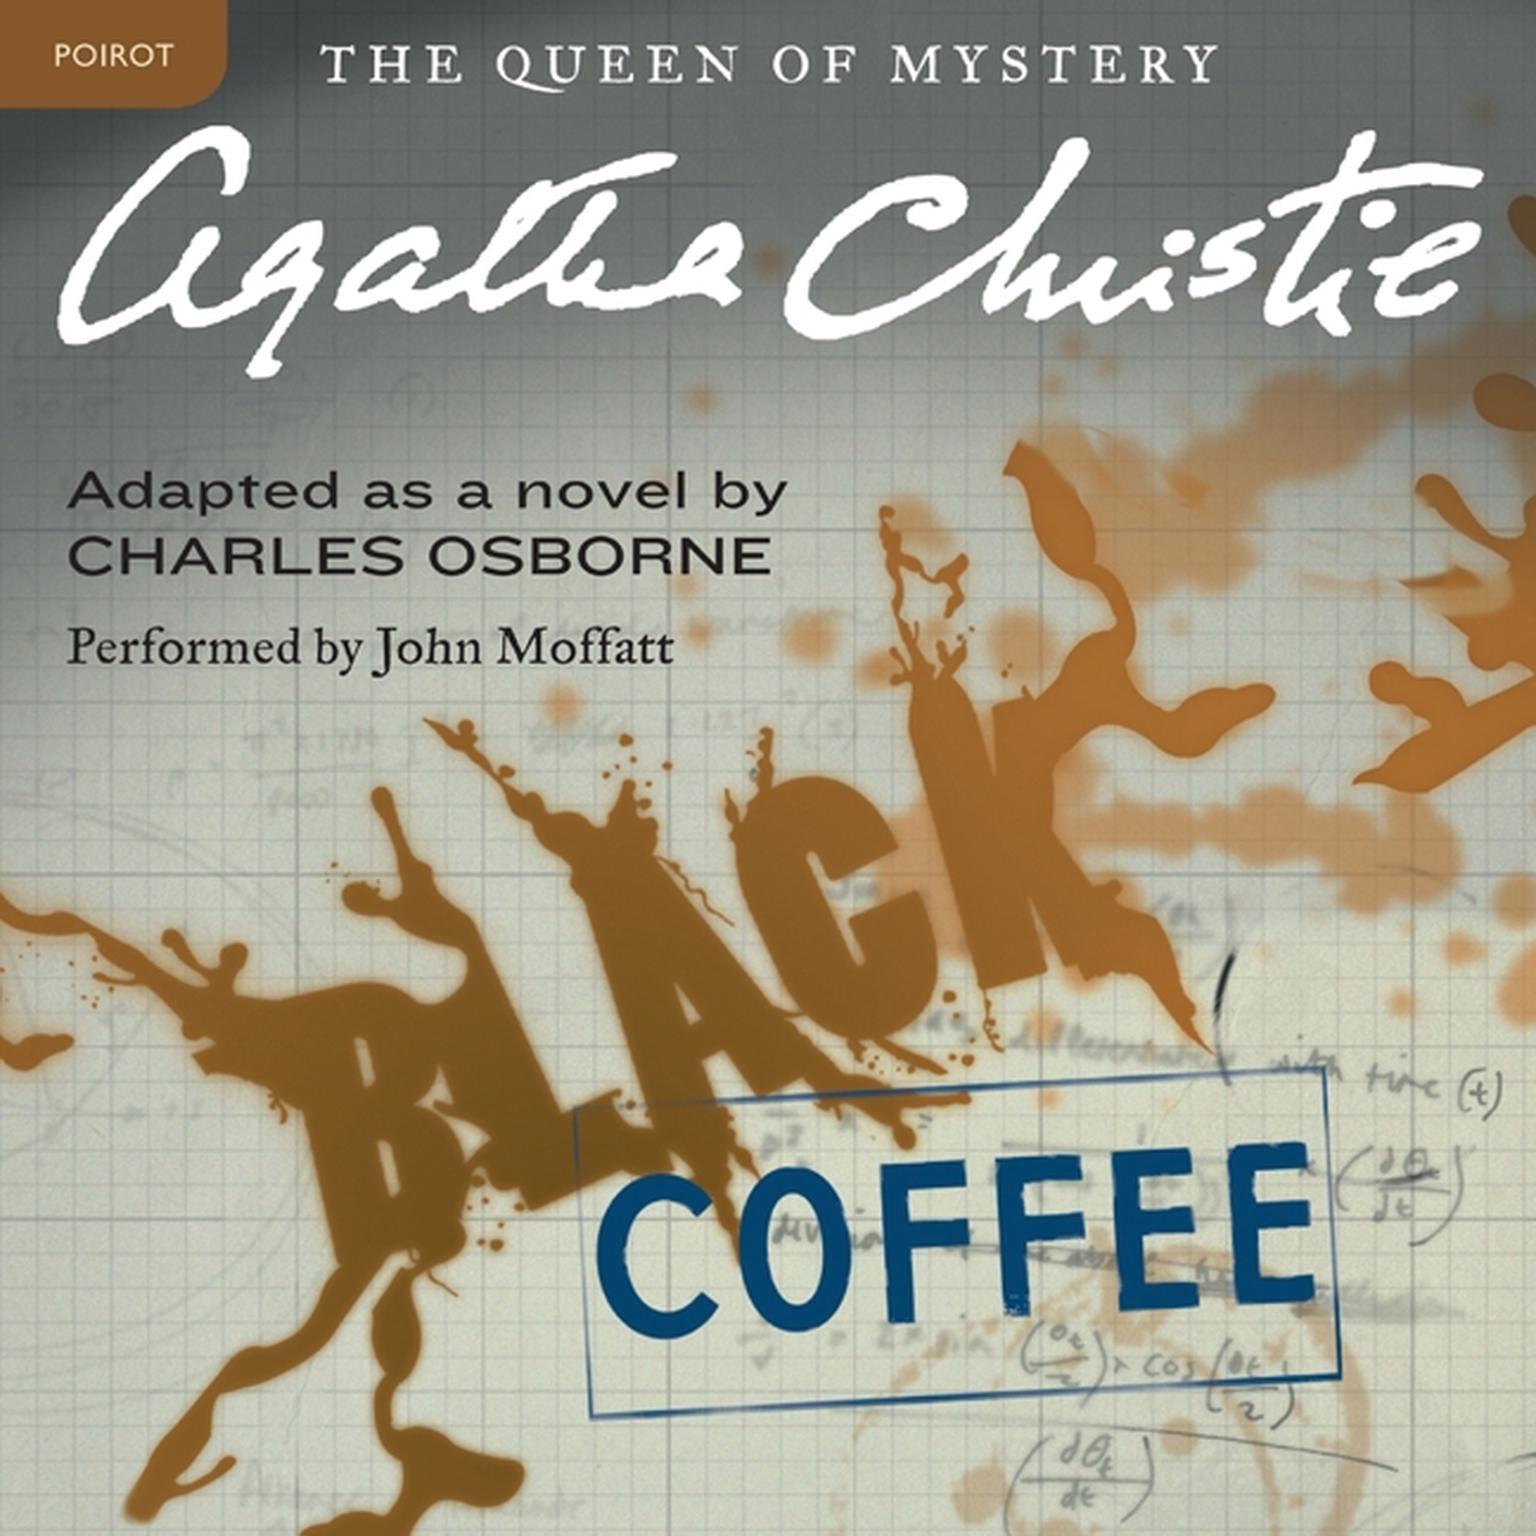 Black Coffee: A Hercule Poirot Mystery Audiobook, by Agatha Christie